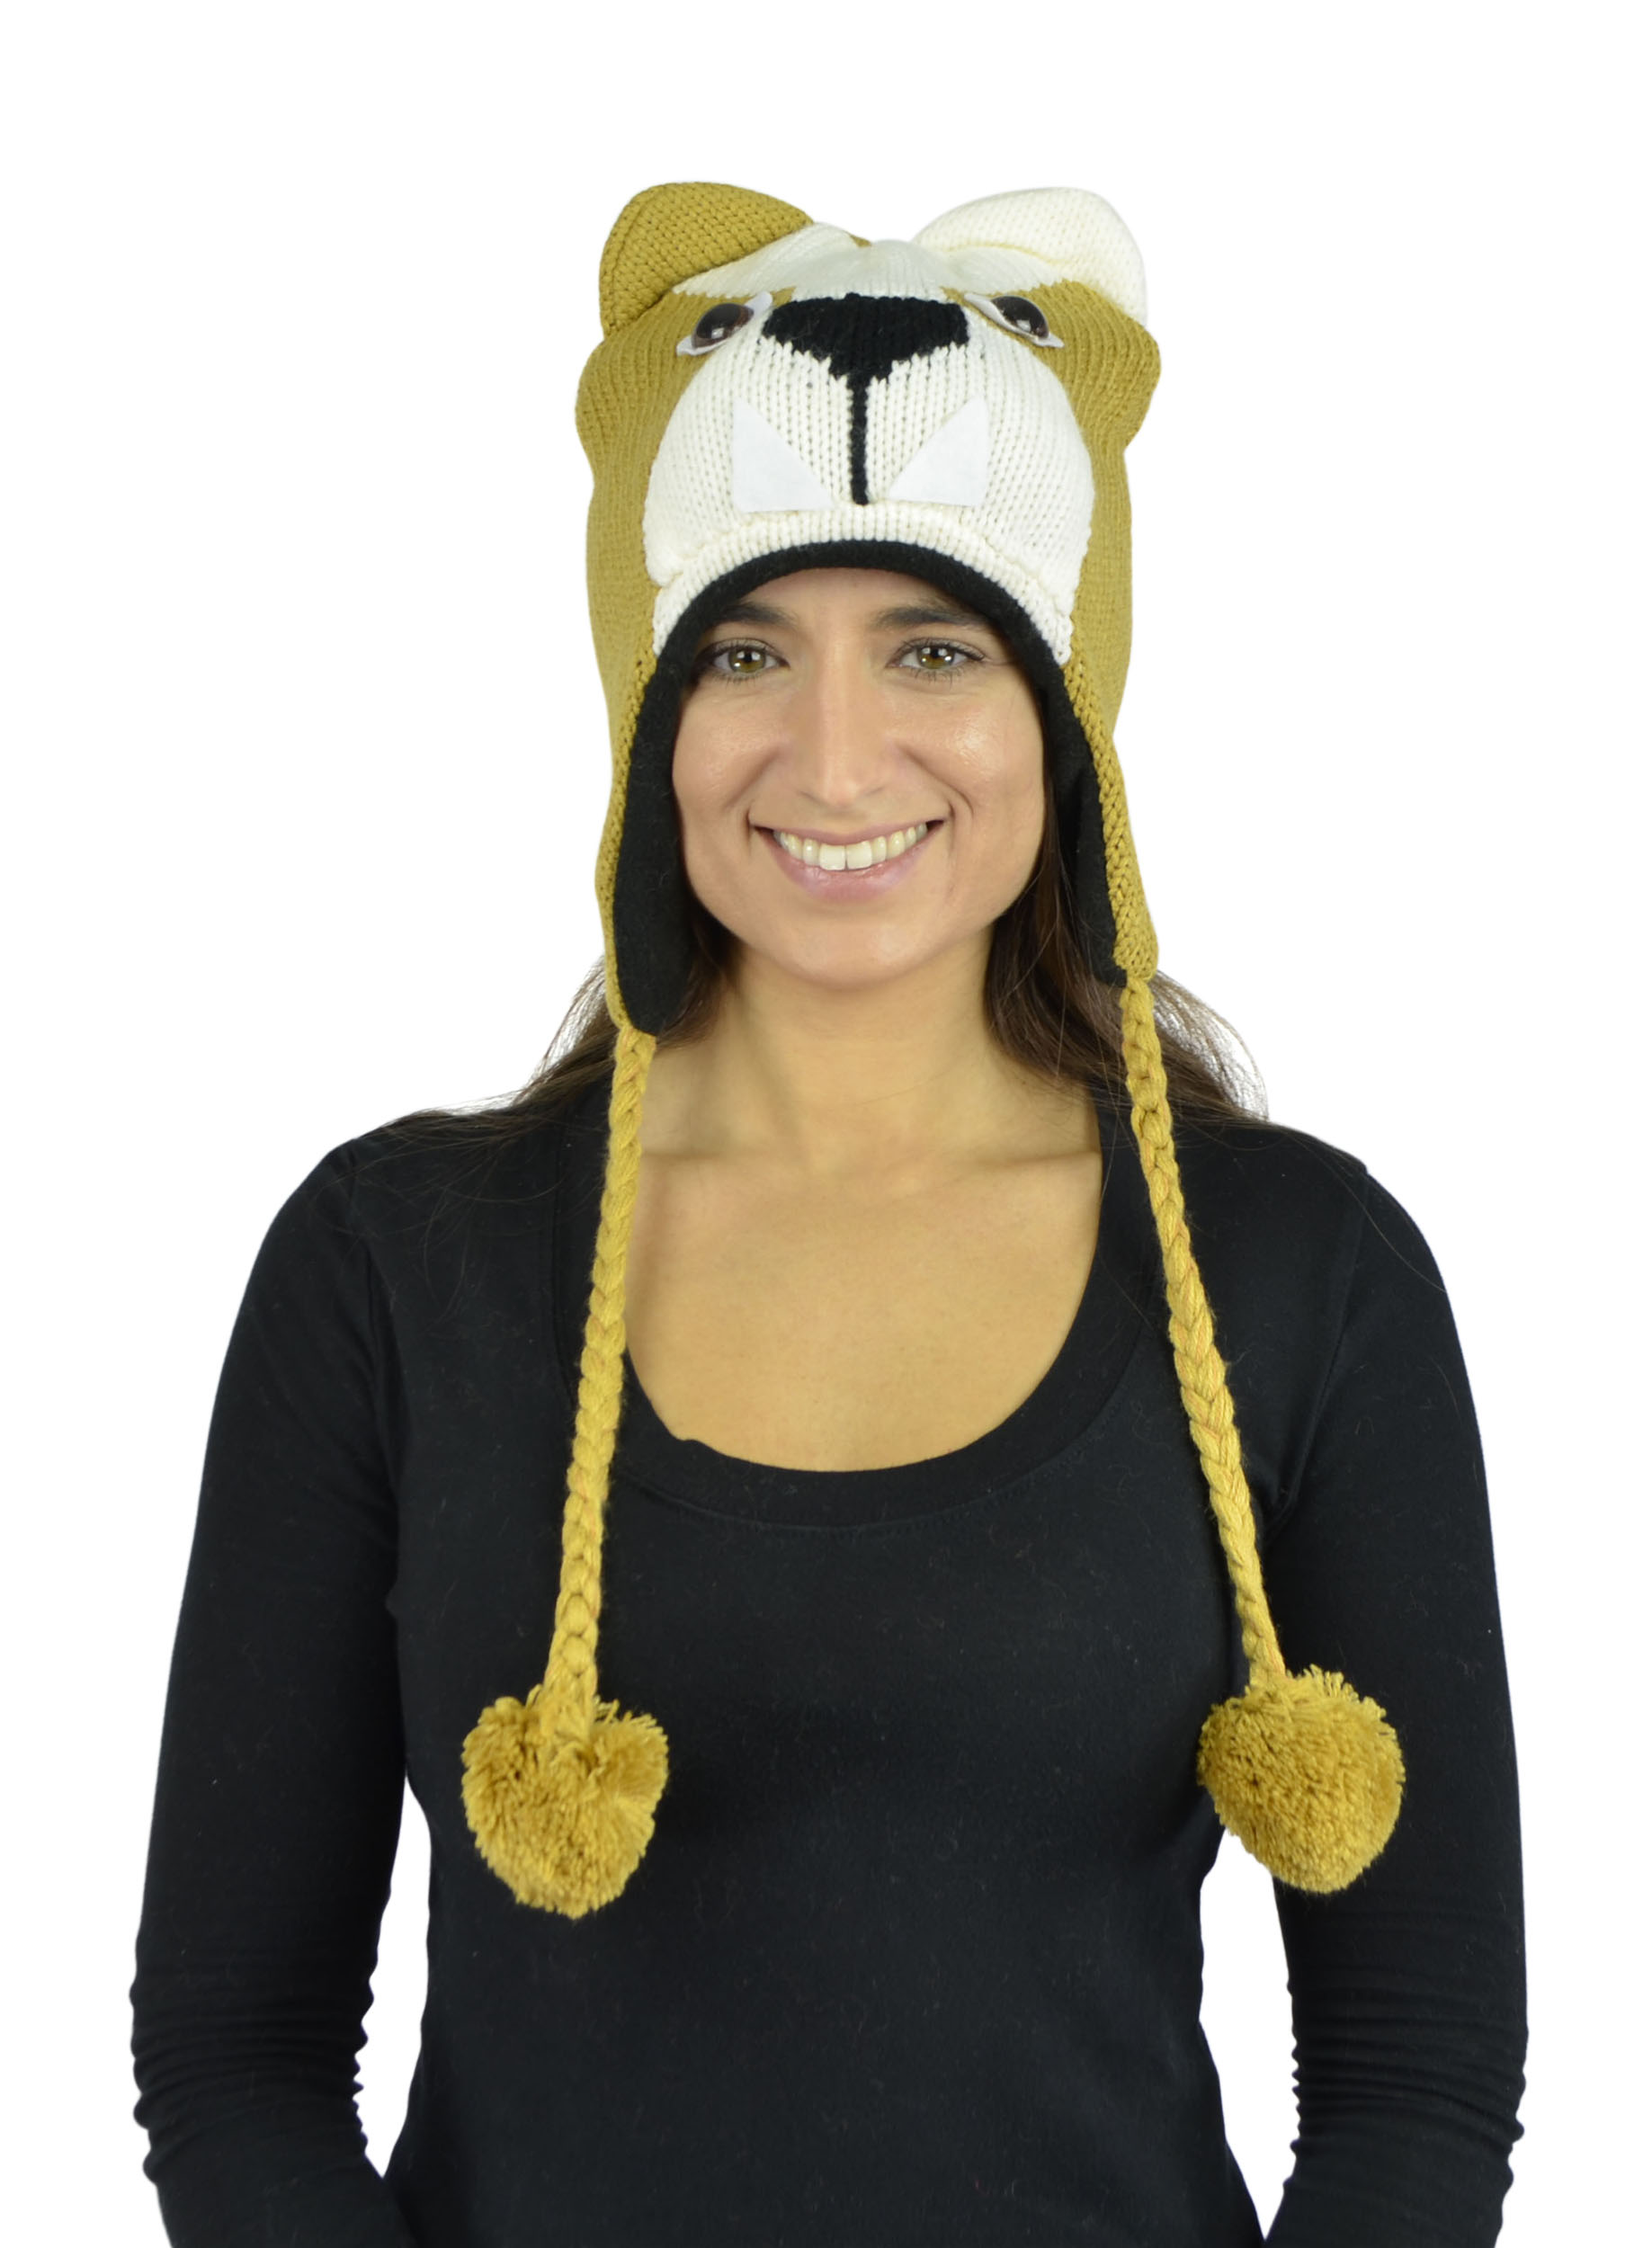 Belle Donne - Unisex Winter Knit Puppy Animal Hats With Pom Pom - Mustard